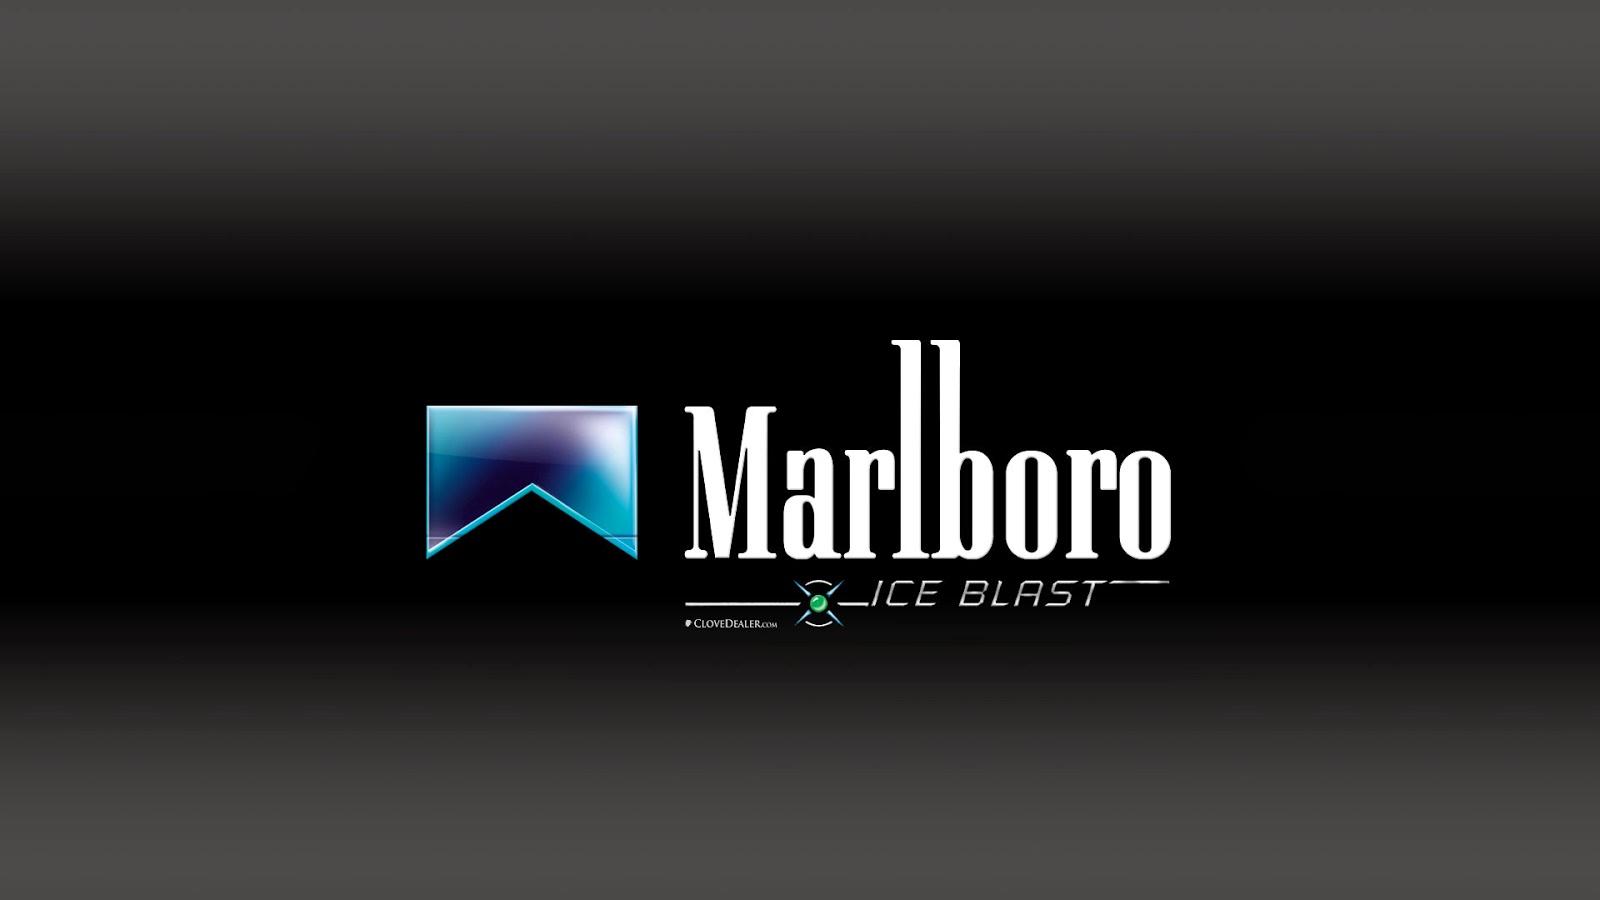 Marlboro Ice Blast Wallpaper HD